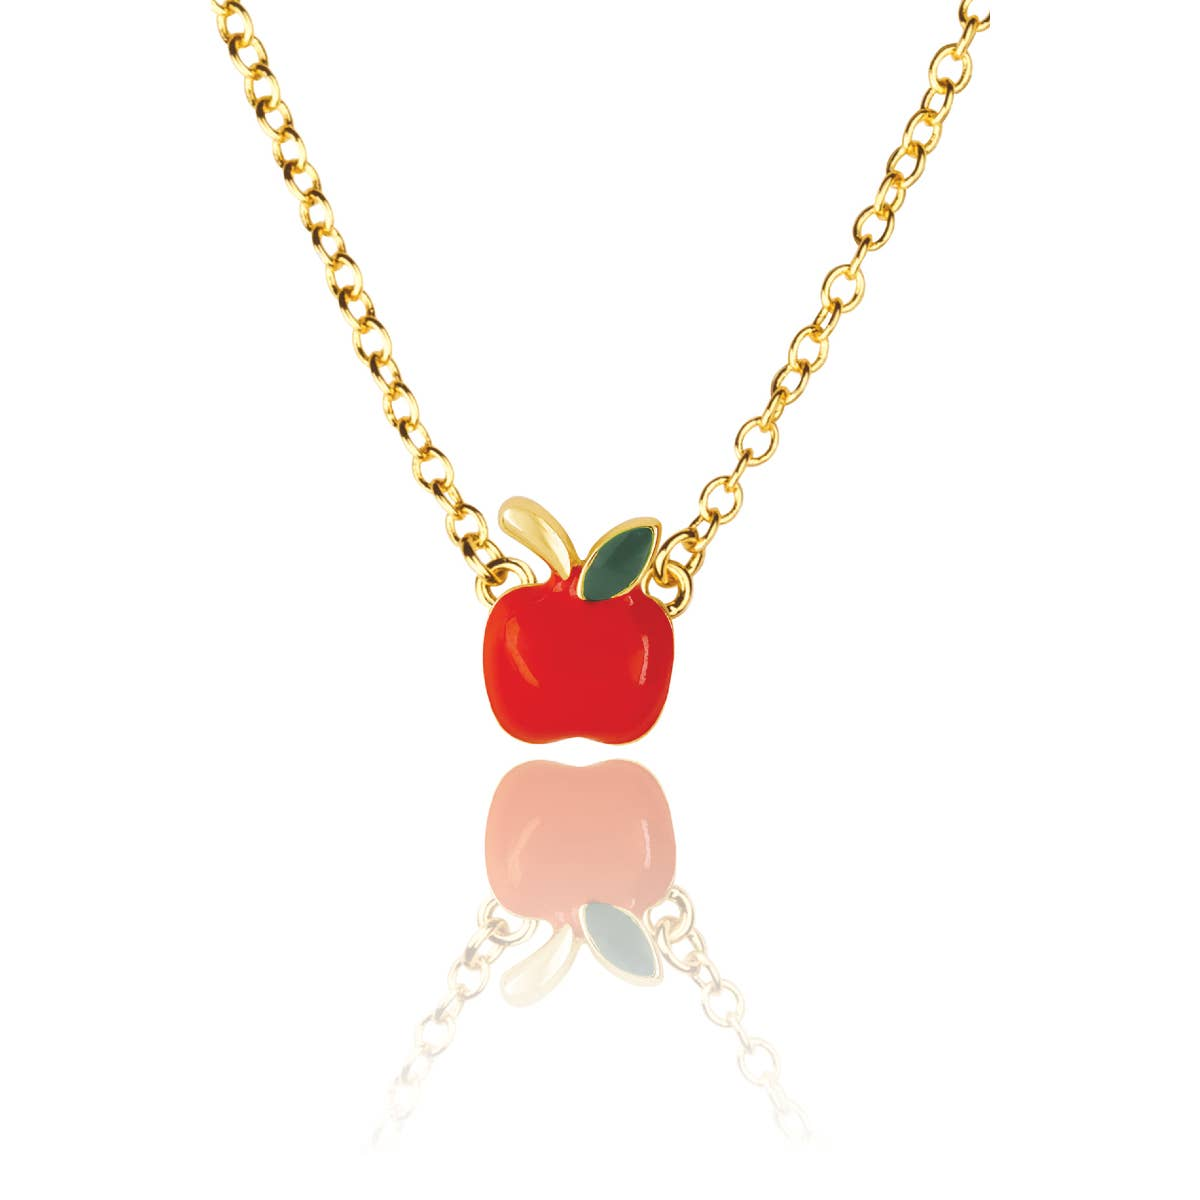 Enamel Apple Necklace   Trada Marketplace